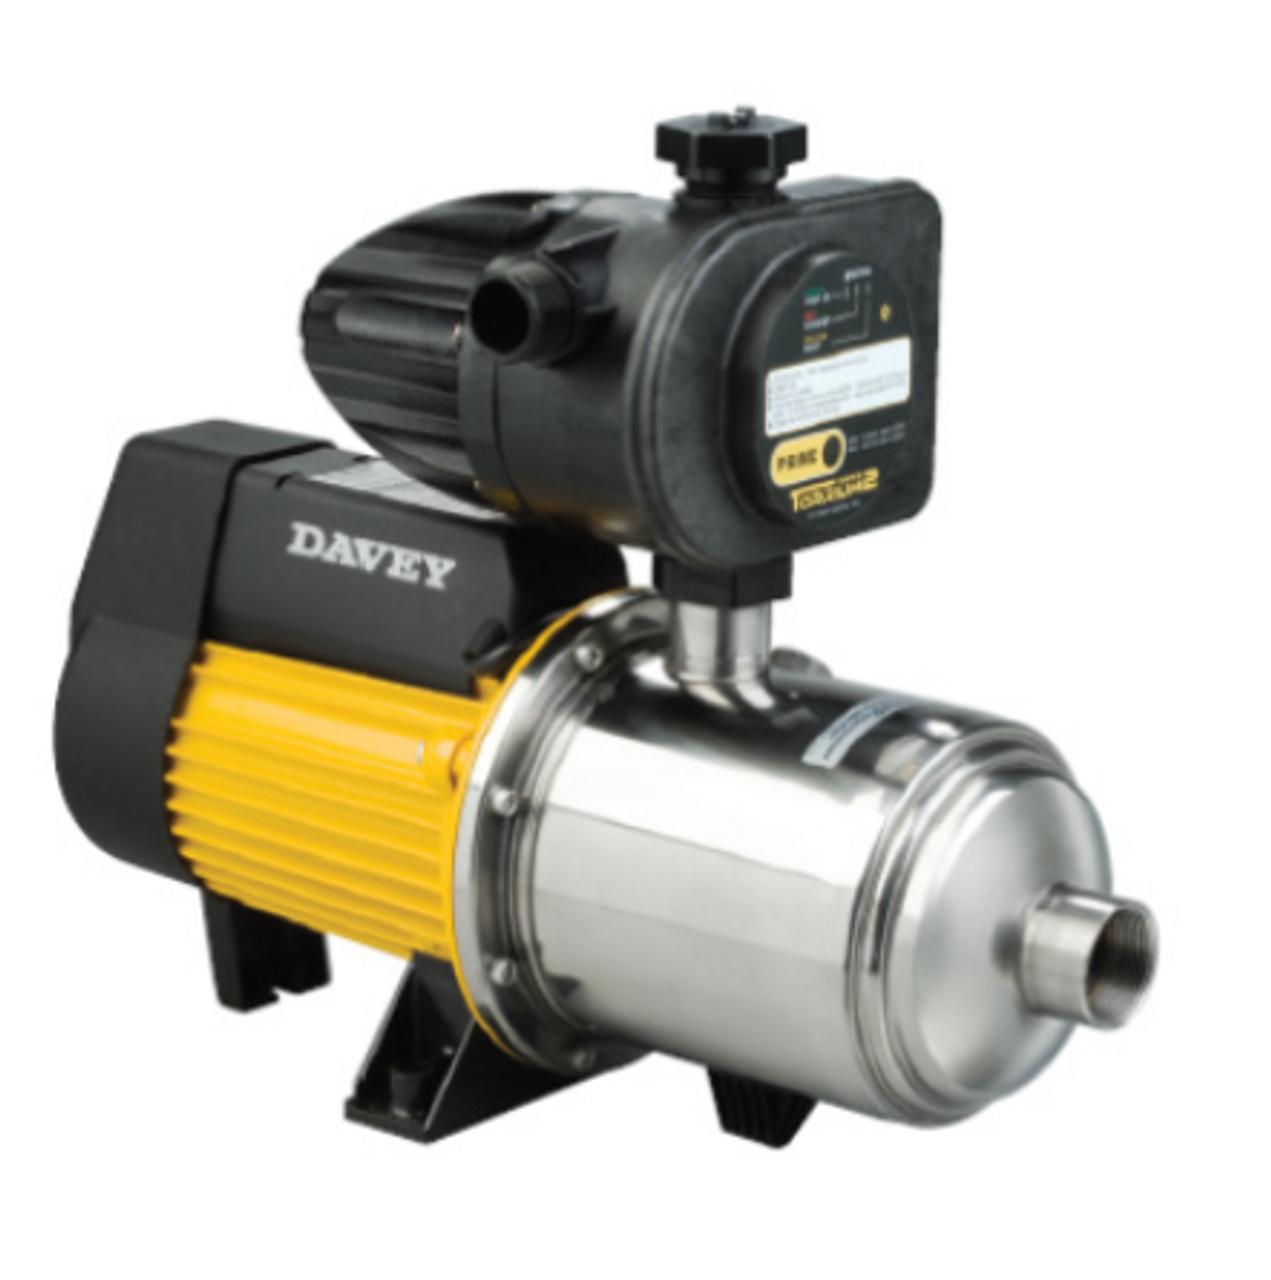 Davey HM60-08T Multistage Pressure Pump